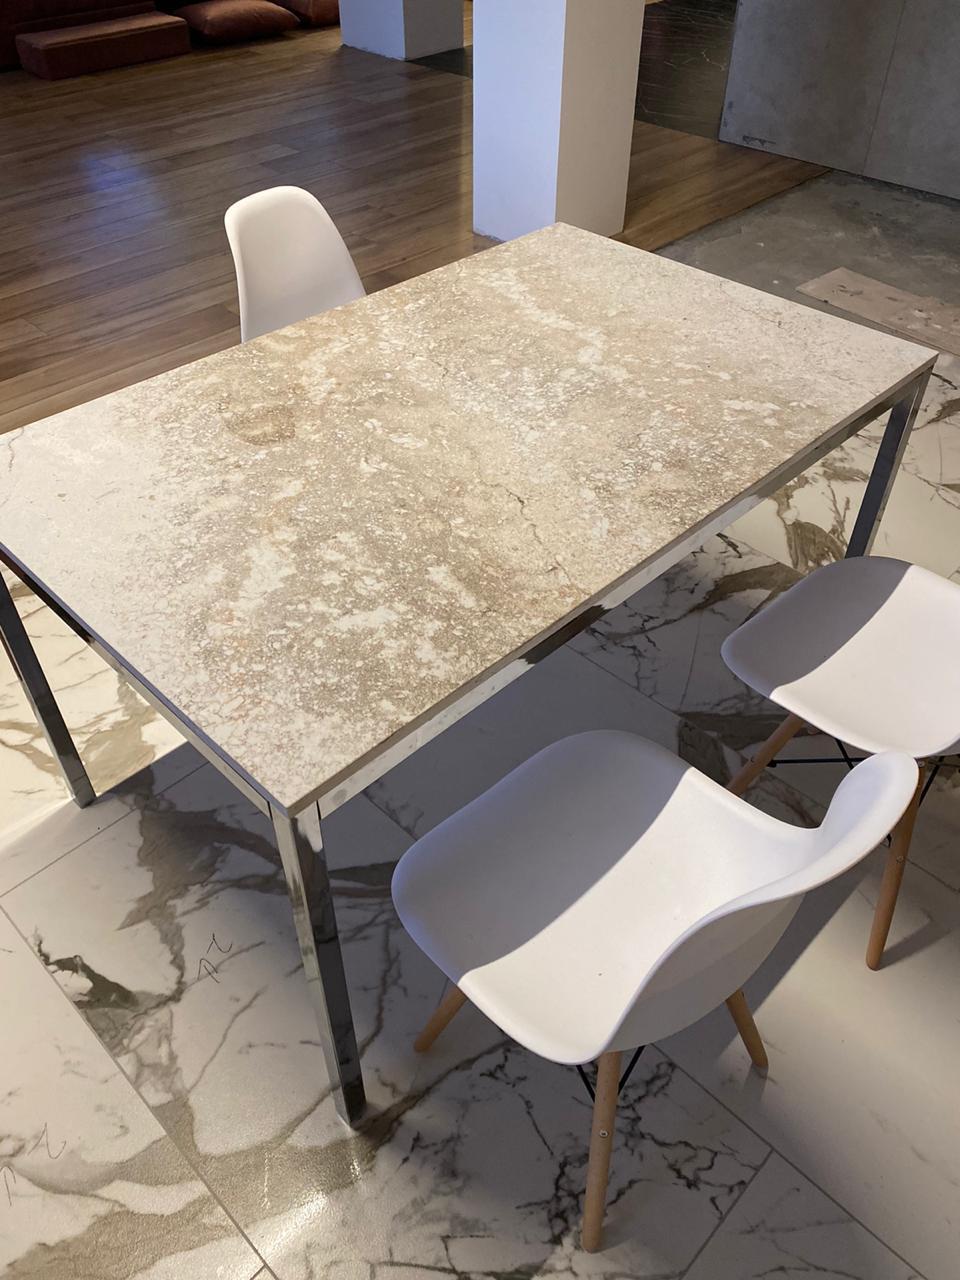 Столешница для обеденного стола из кварцевого агломерата Caesar Stone Excava